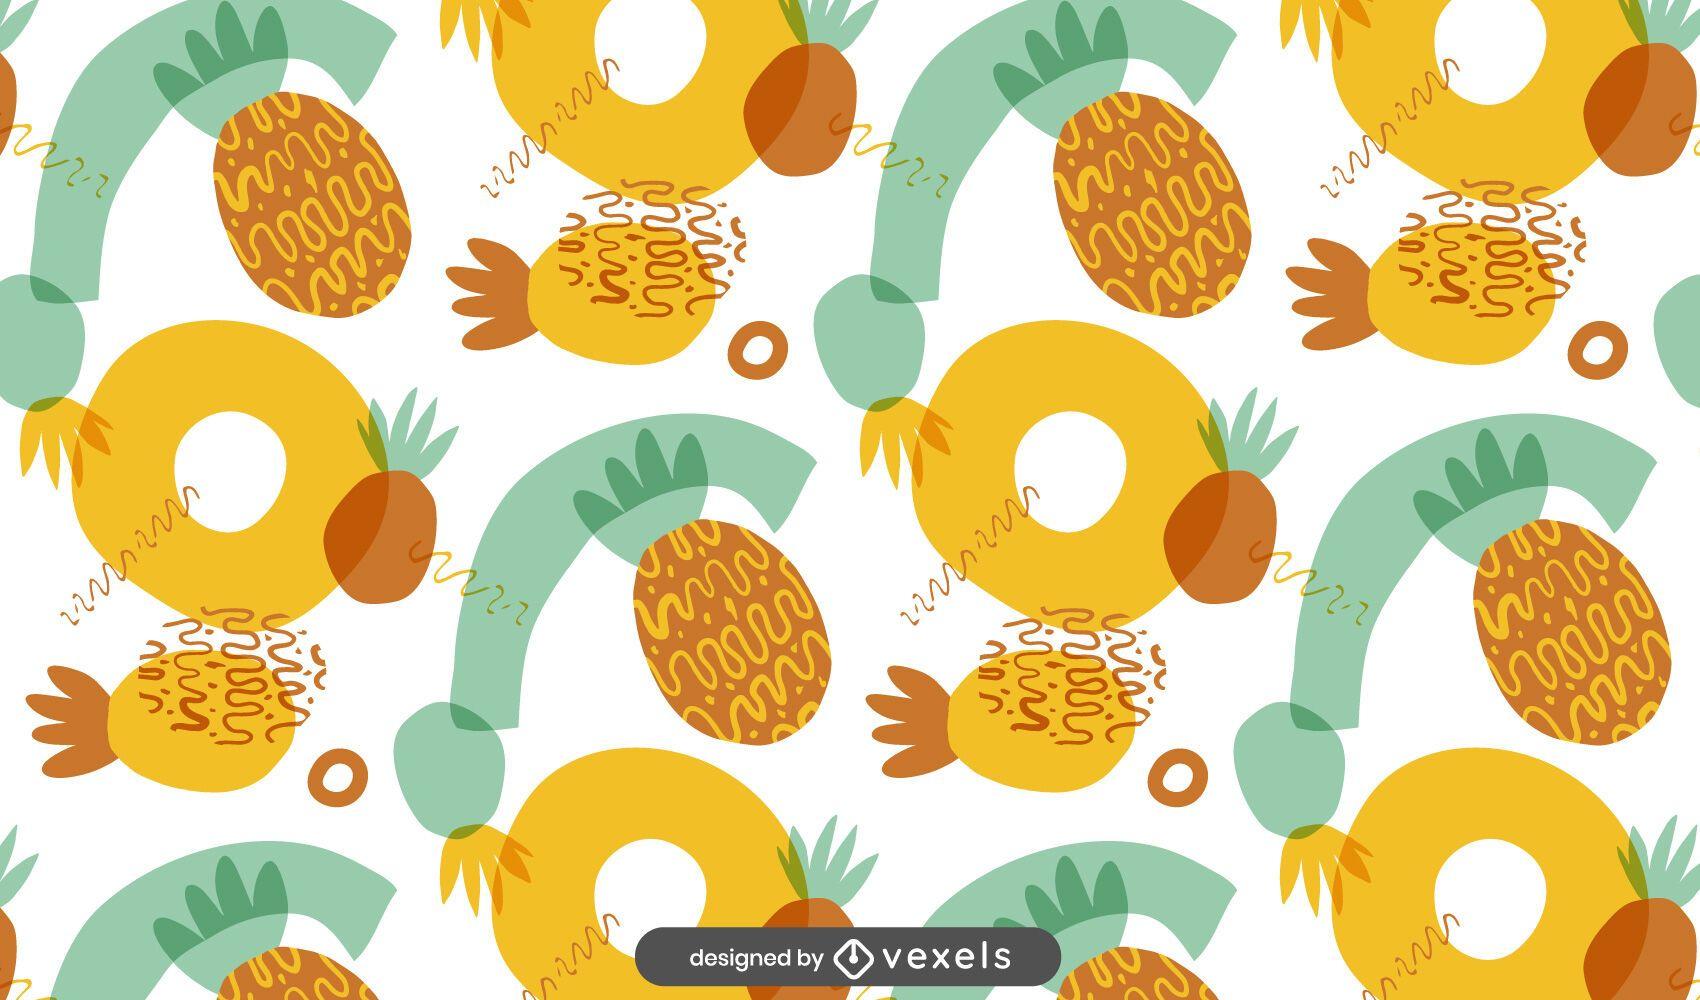 Diseño de patrón abstracto de piñas